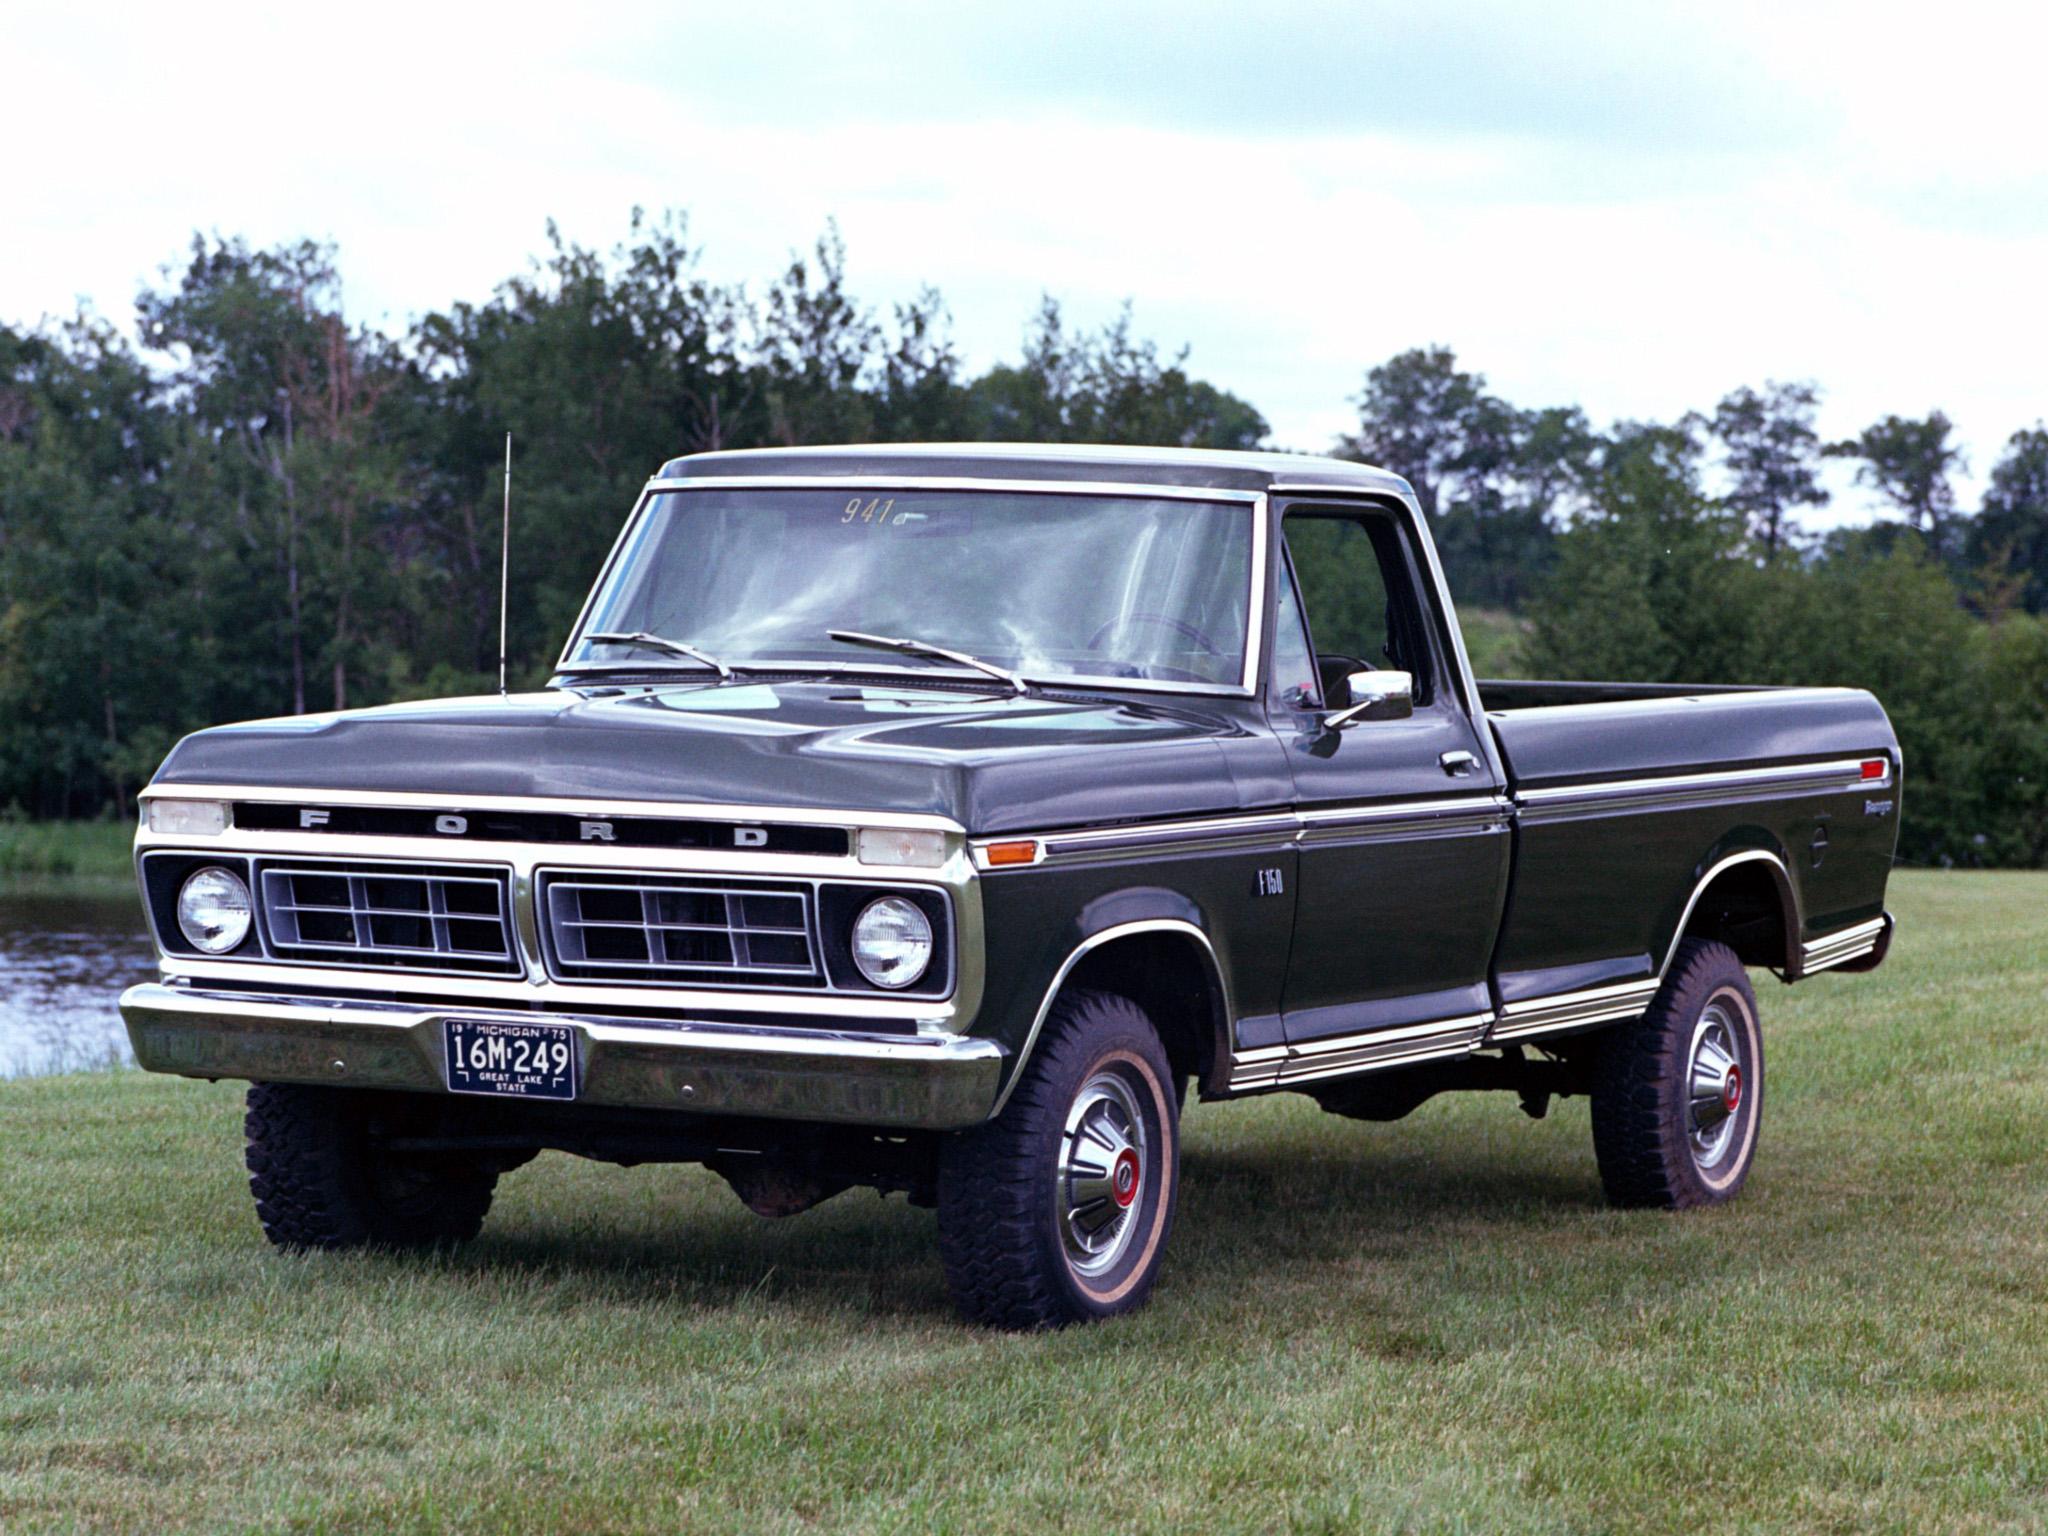 1976 ford f 150 ranger 4x4 pickup wallpaper 2048x1536 142541 wallpaperup. Black Bedroom Furniture Sets. Home Design Ideas